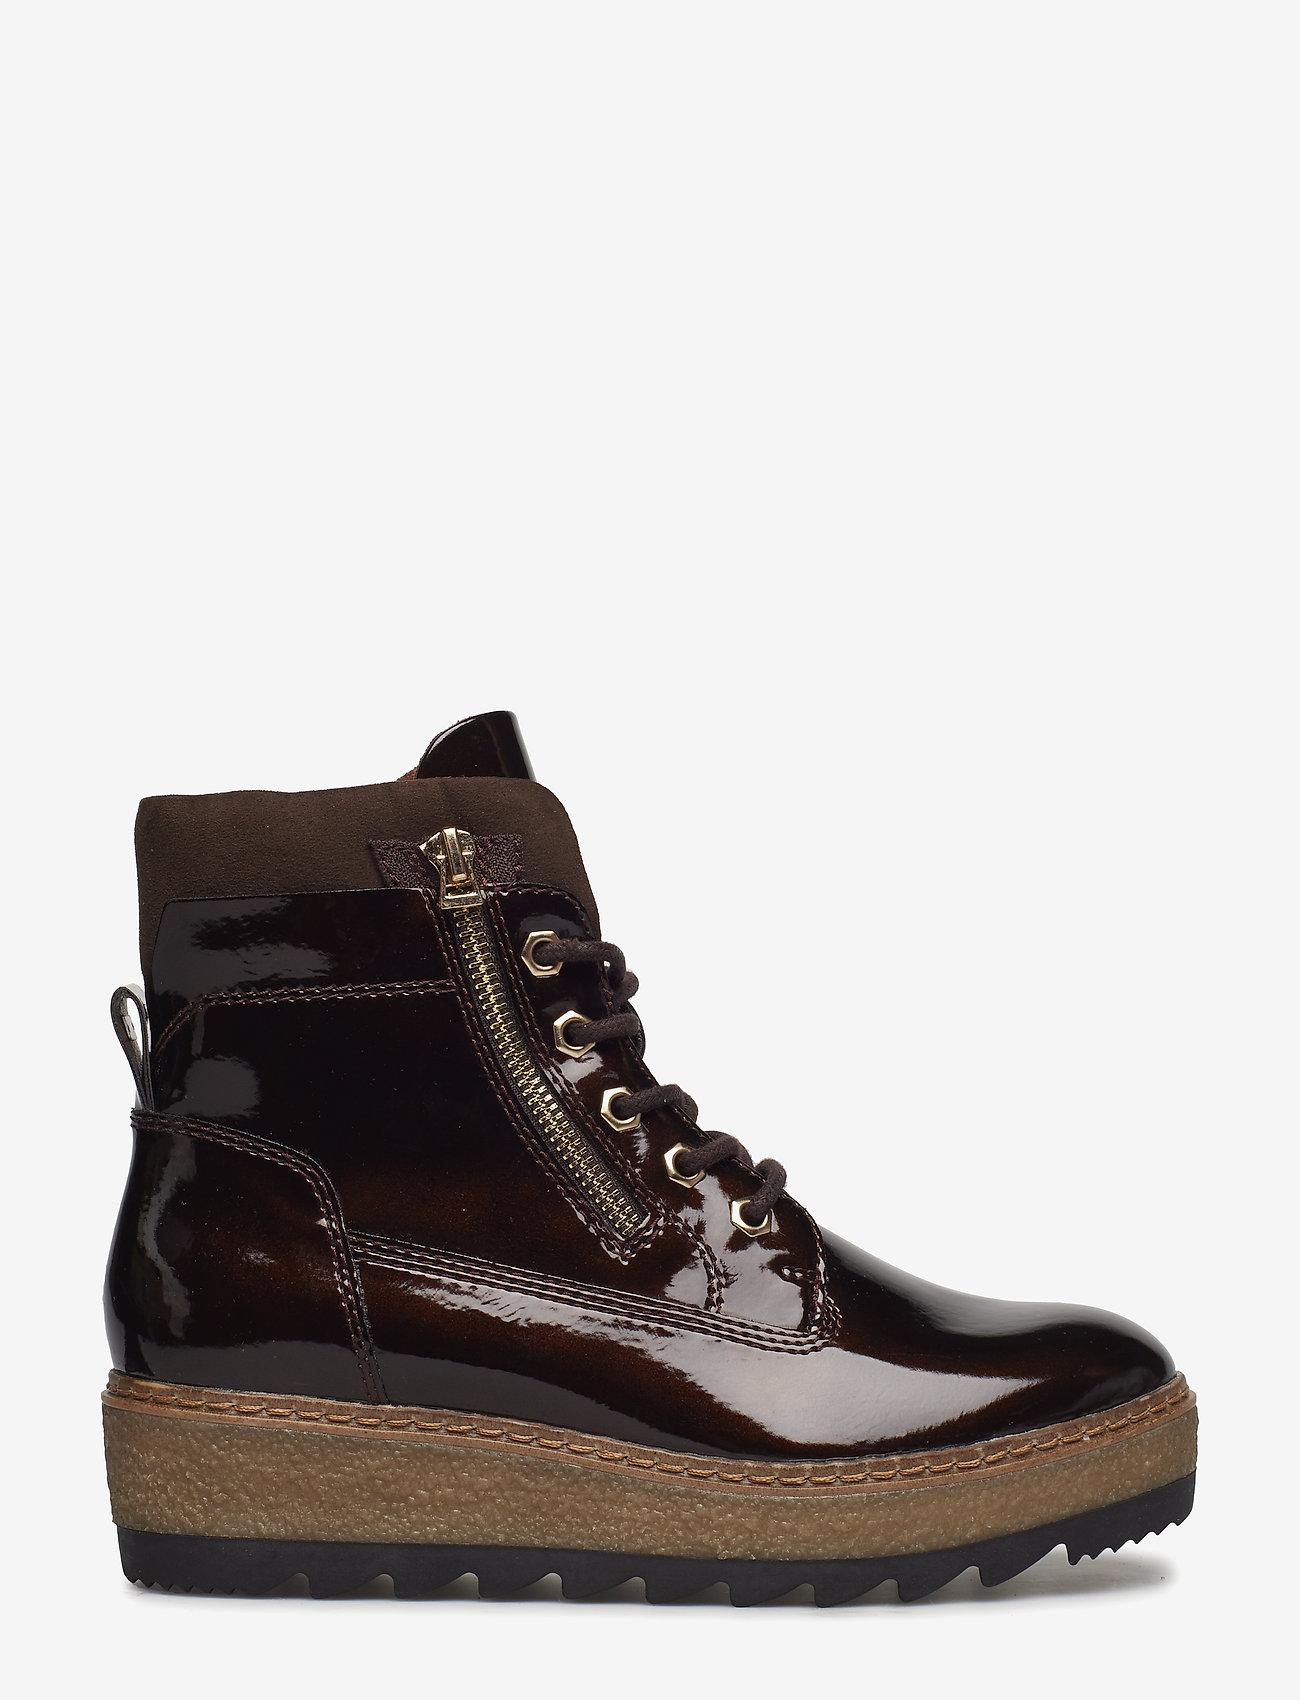 Tamaris - Woms Boots - talon bas - maroon pat.